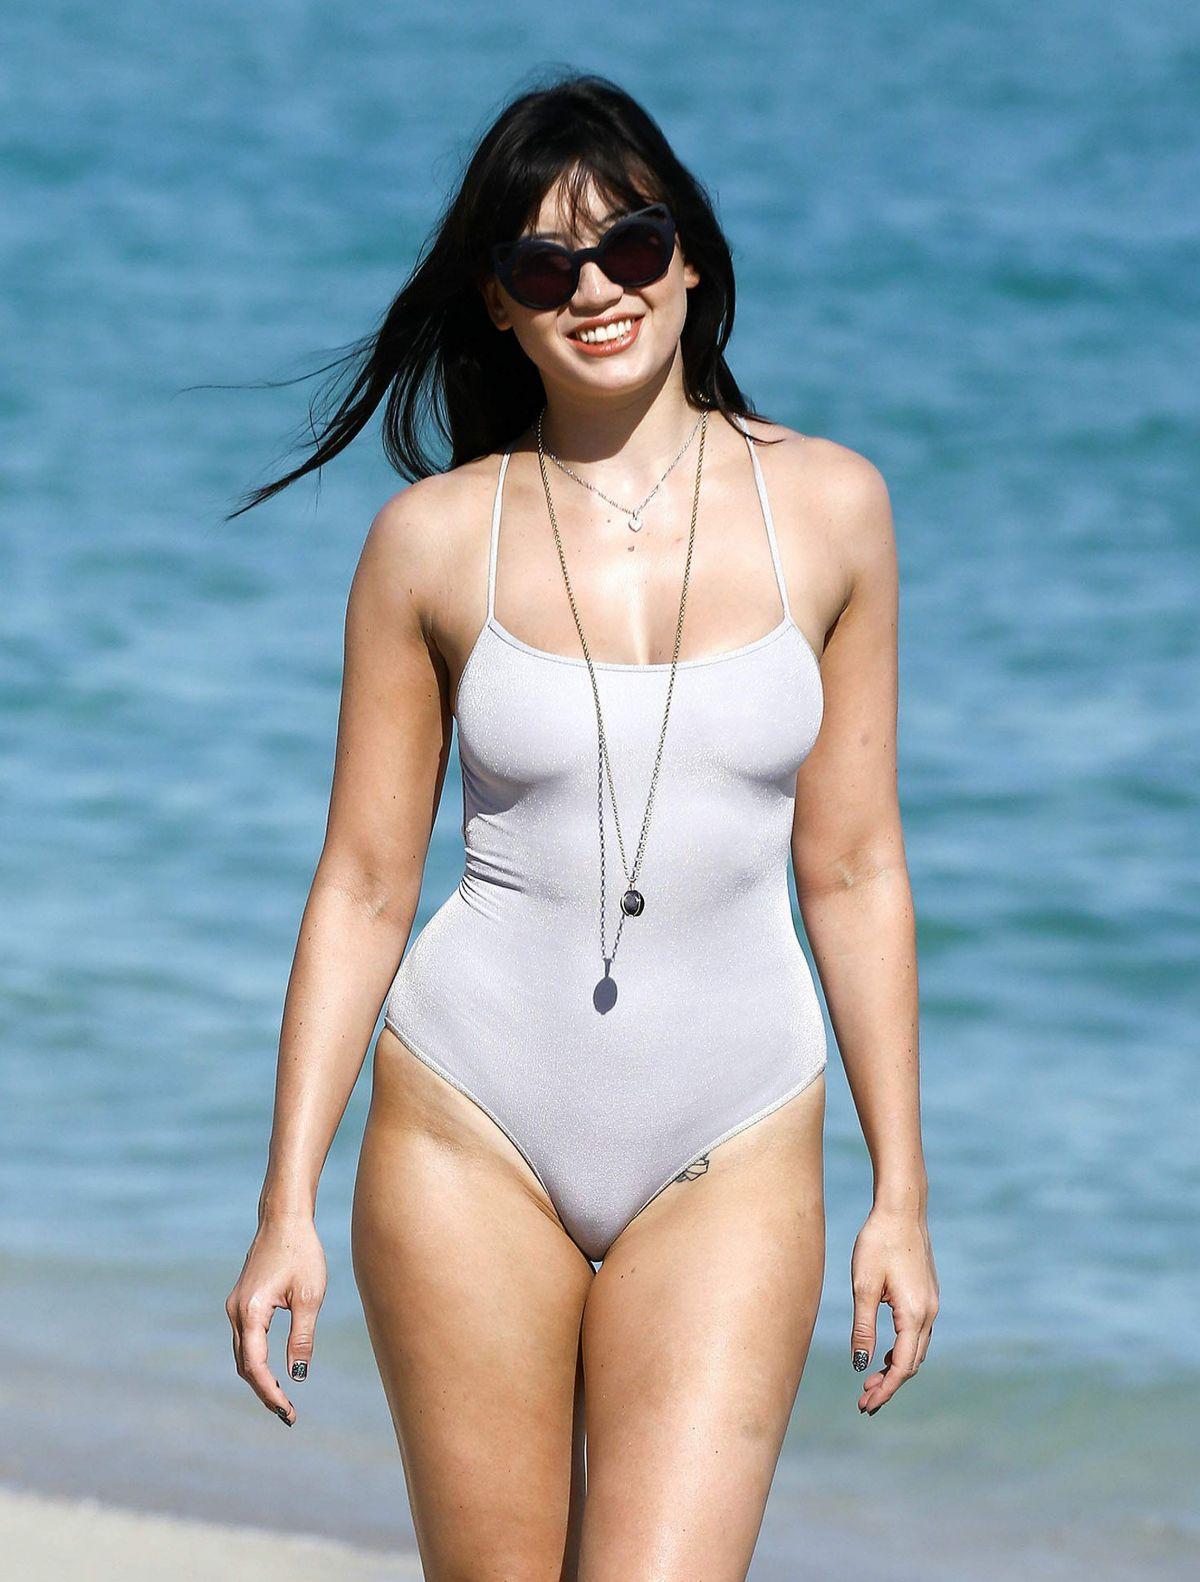 Watch Daisy lowe bikini video